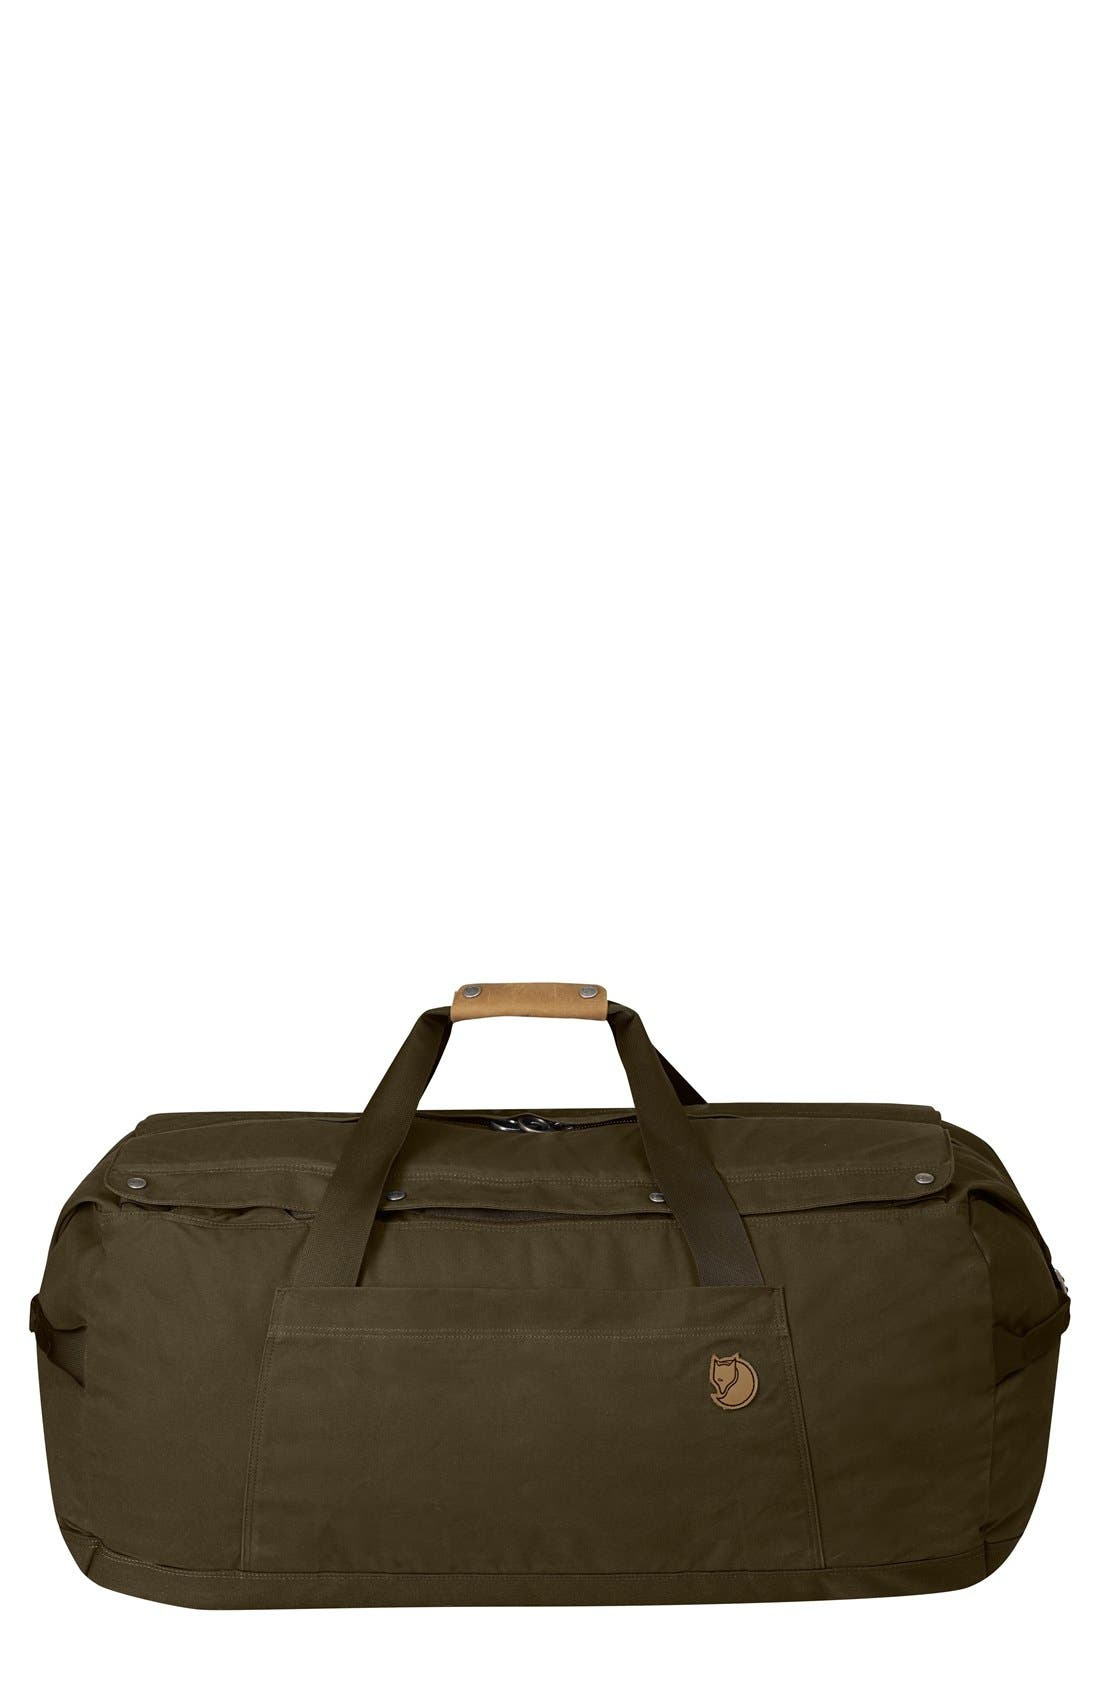 'Duffel Bag No. 6' Large Duffel Bag,                             Main thumbnail 3, color,